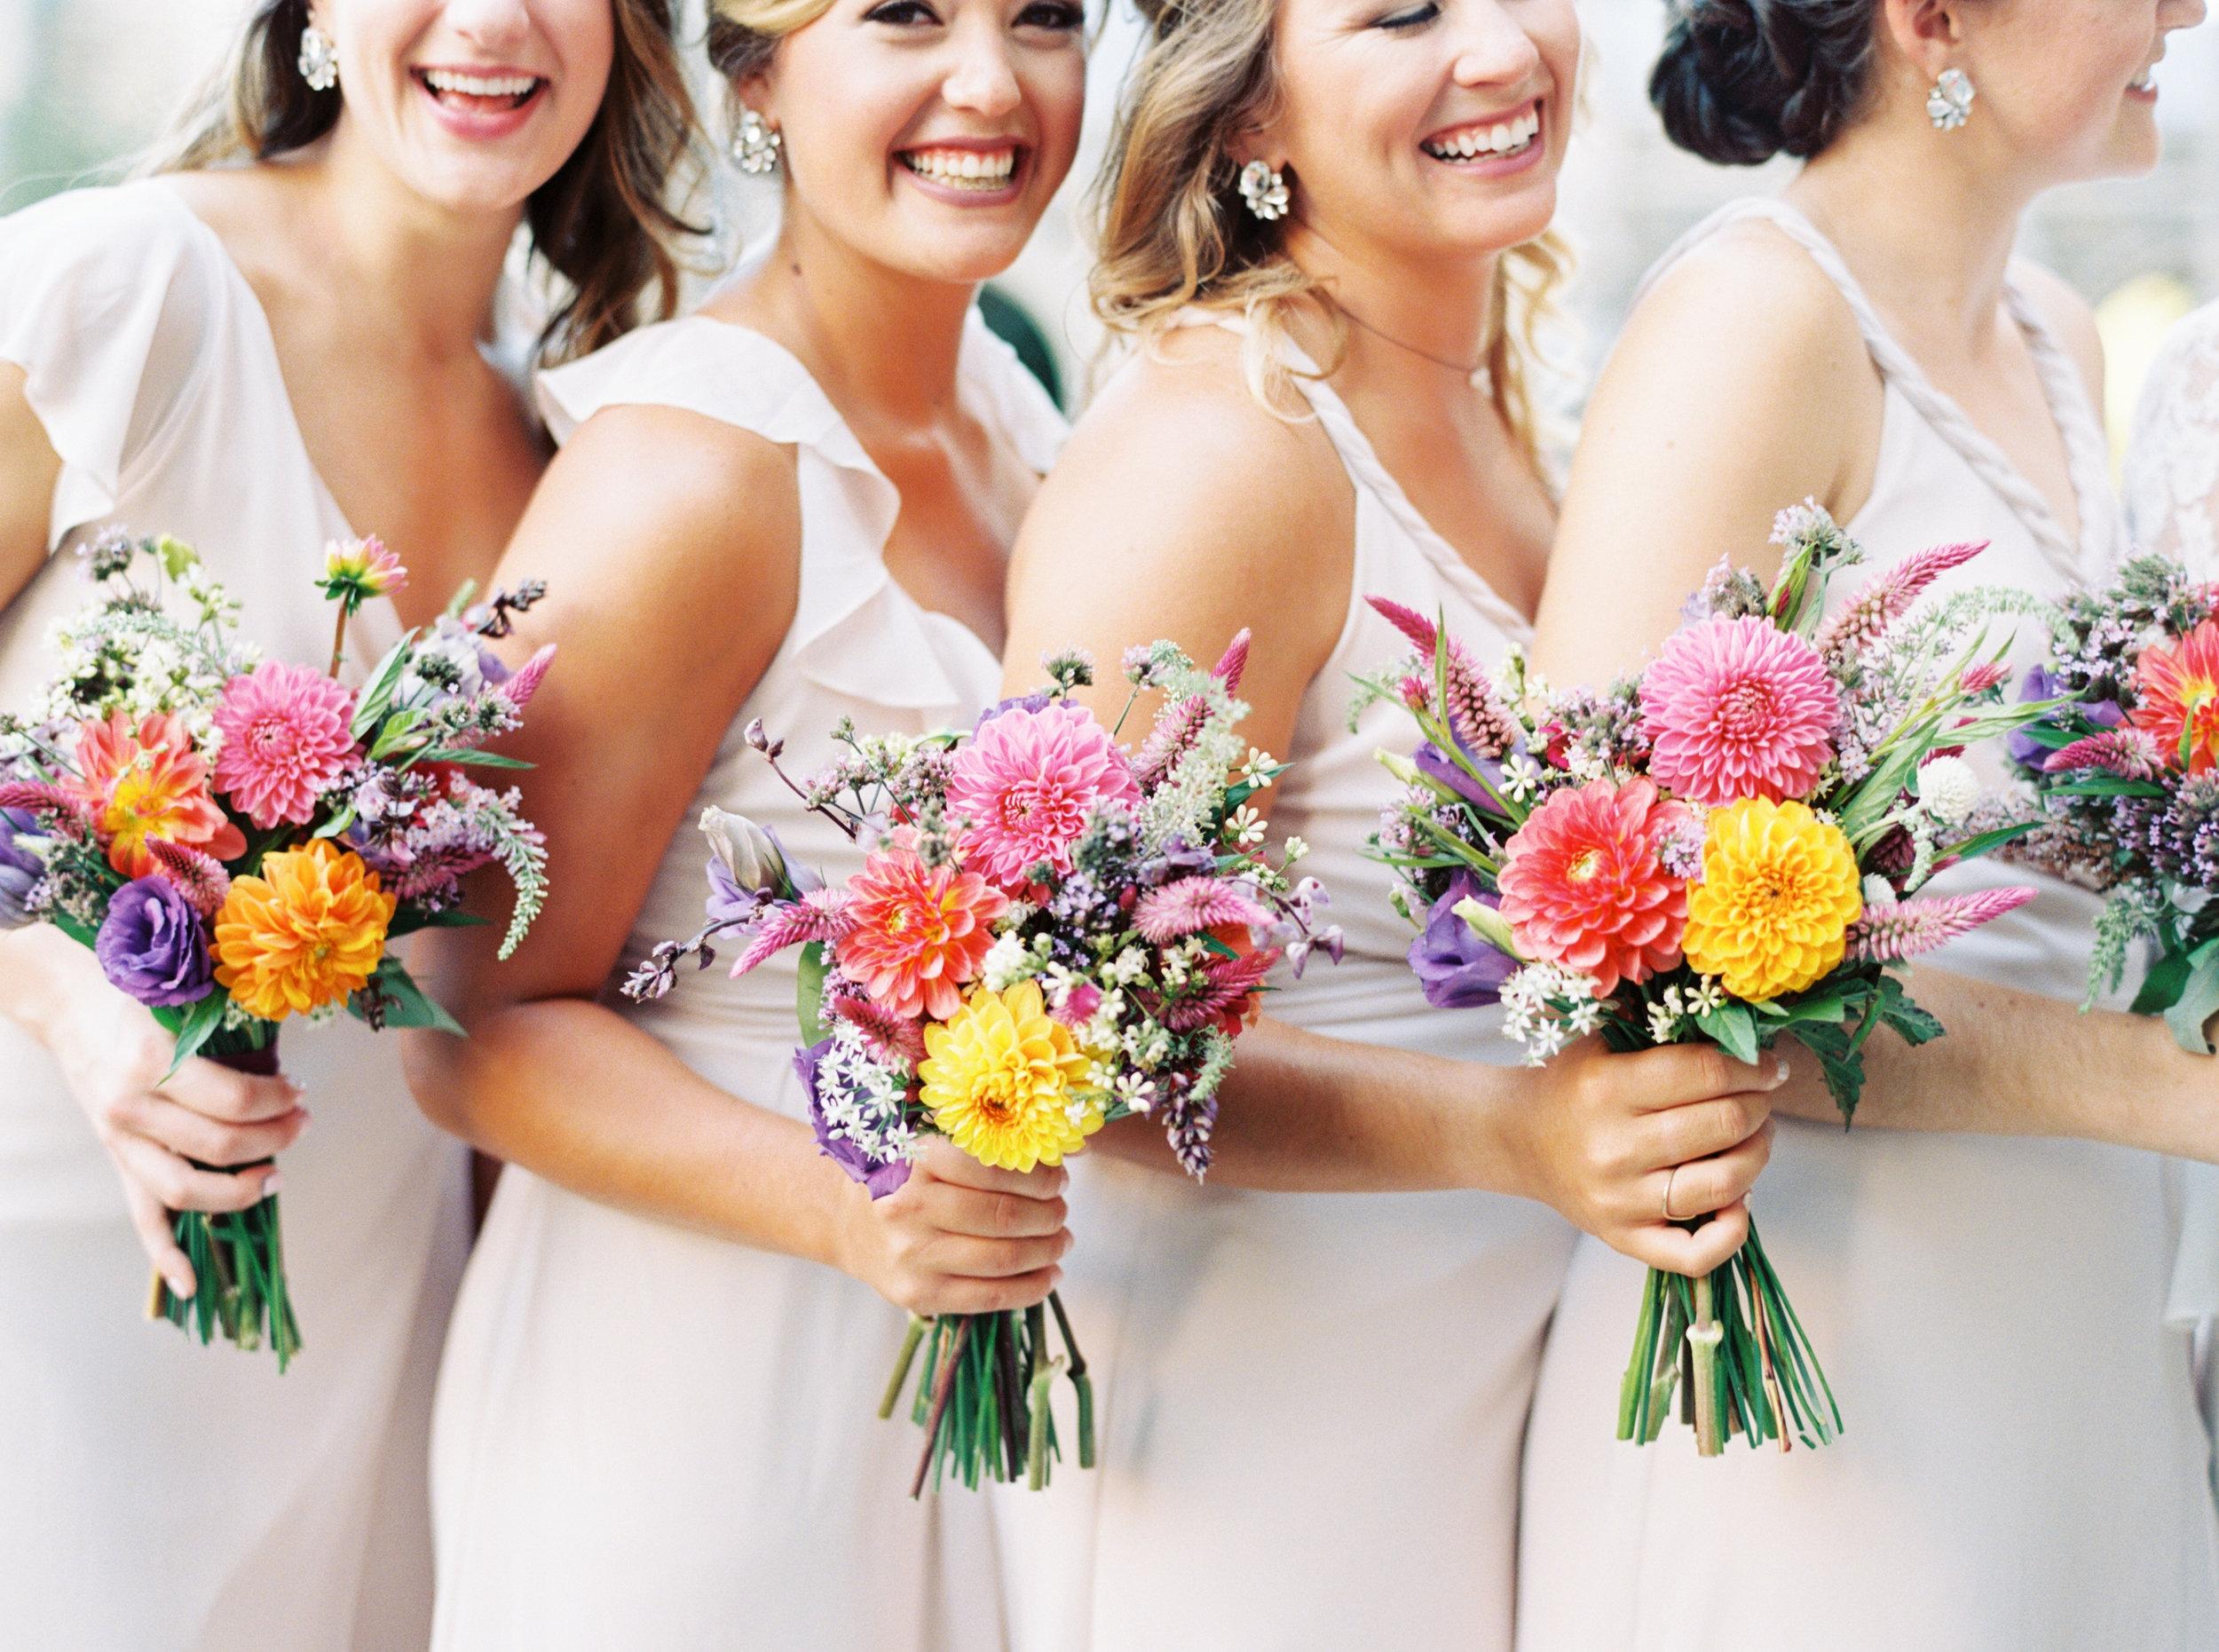 Bridesmaids7.jpg